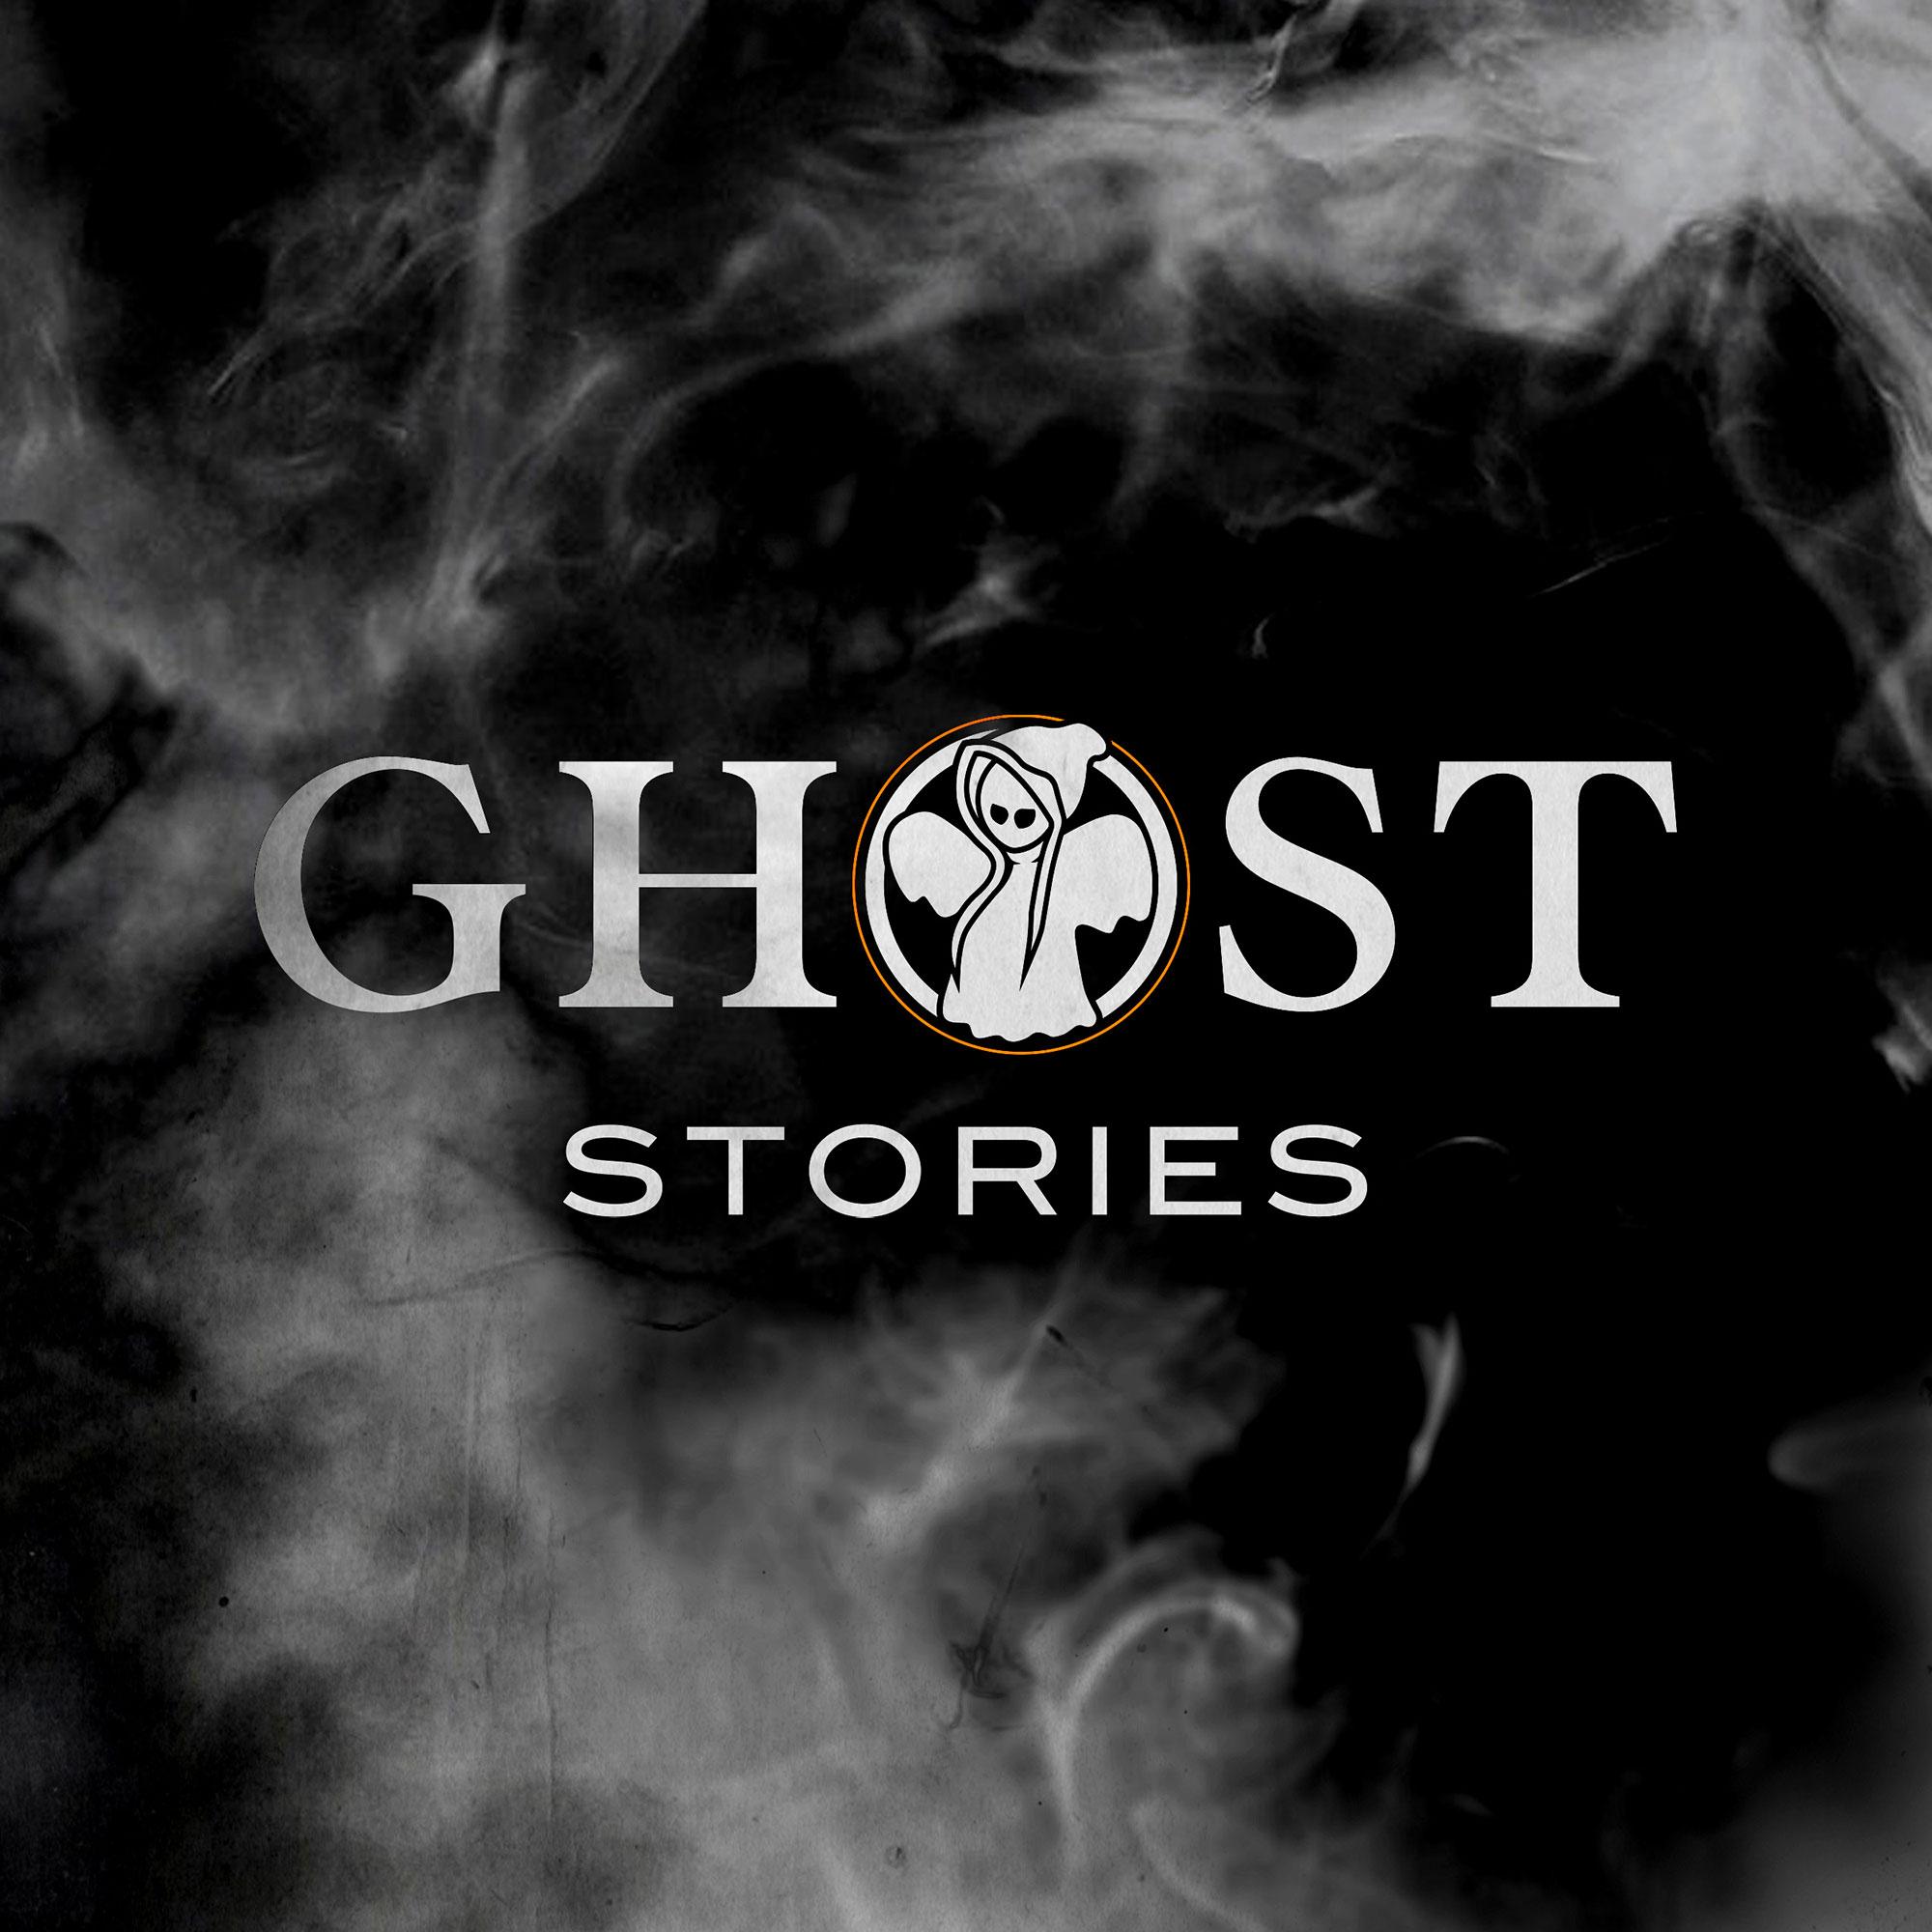 09-GhostStories-DBSTF-02a